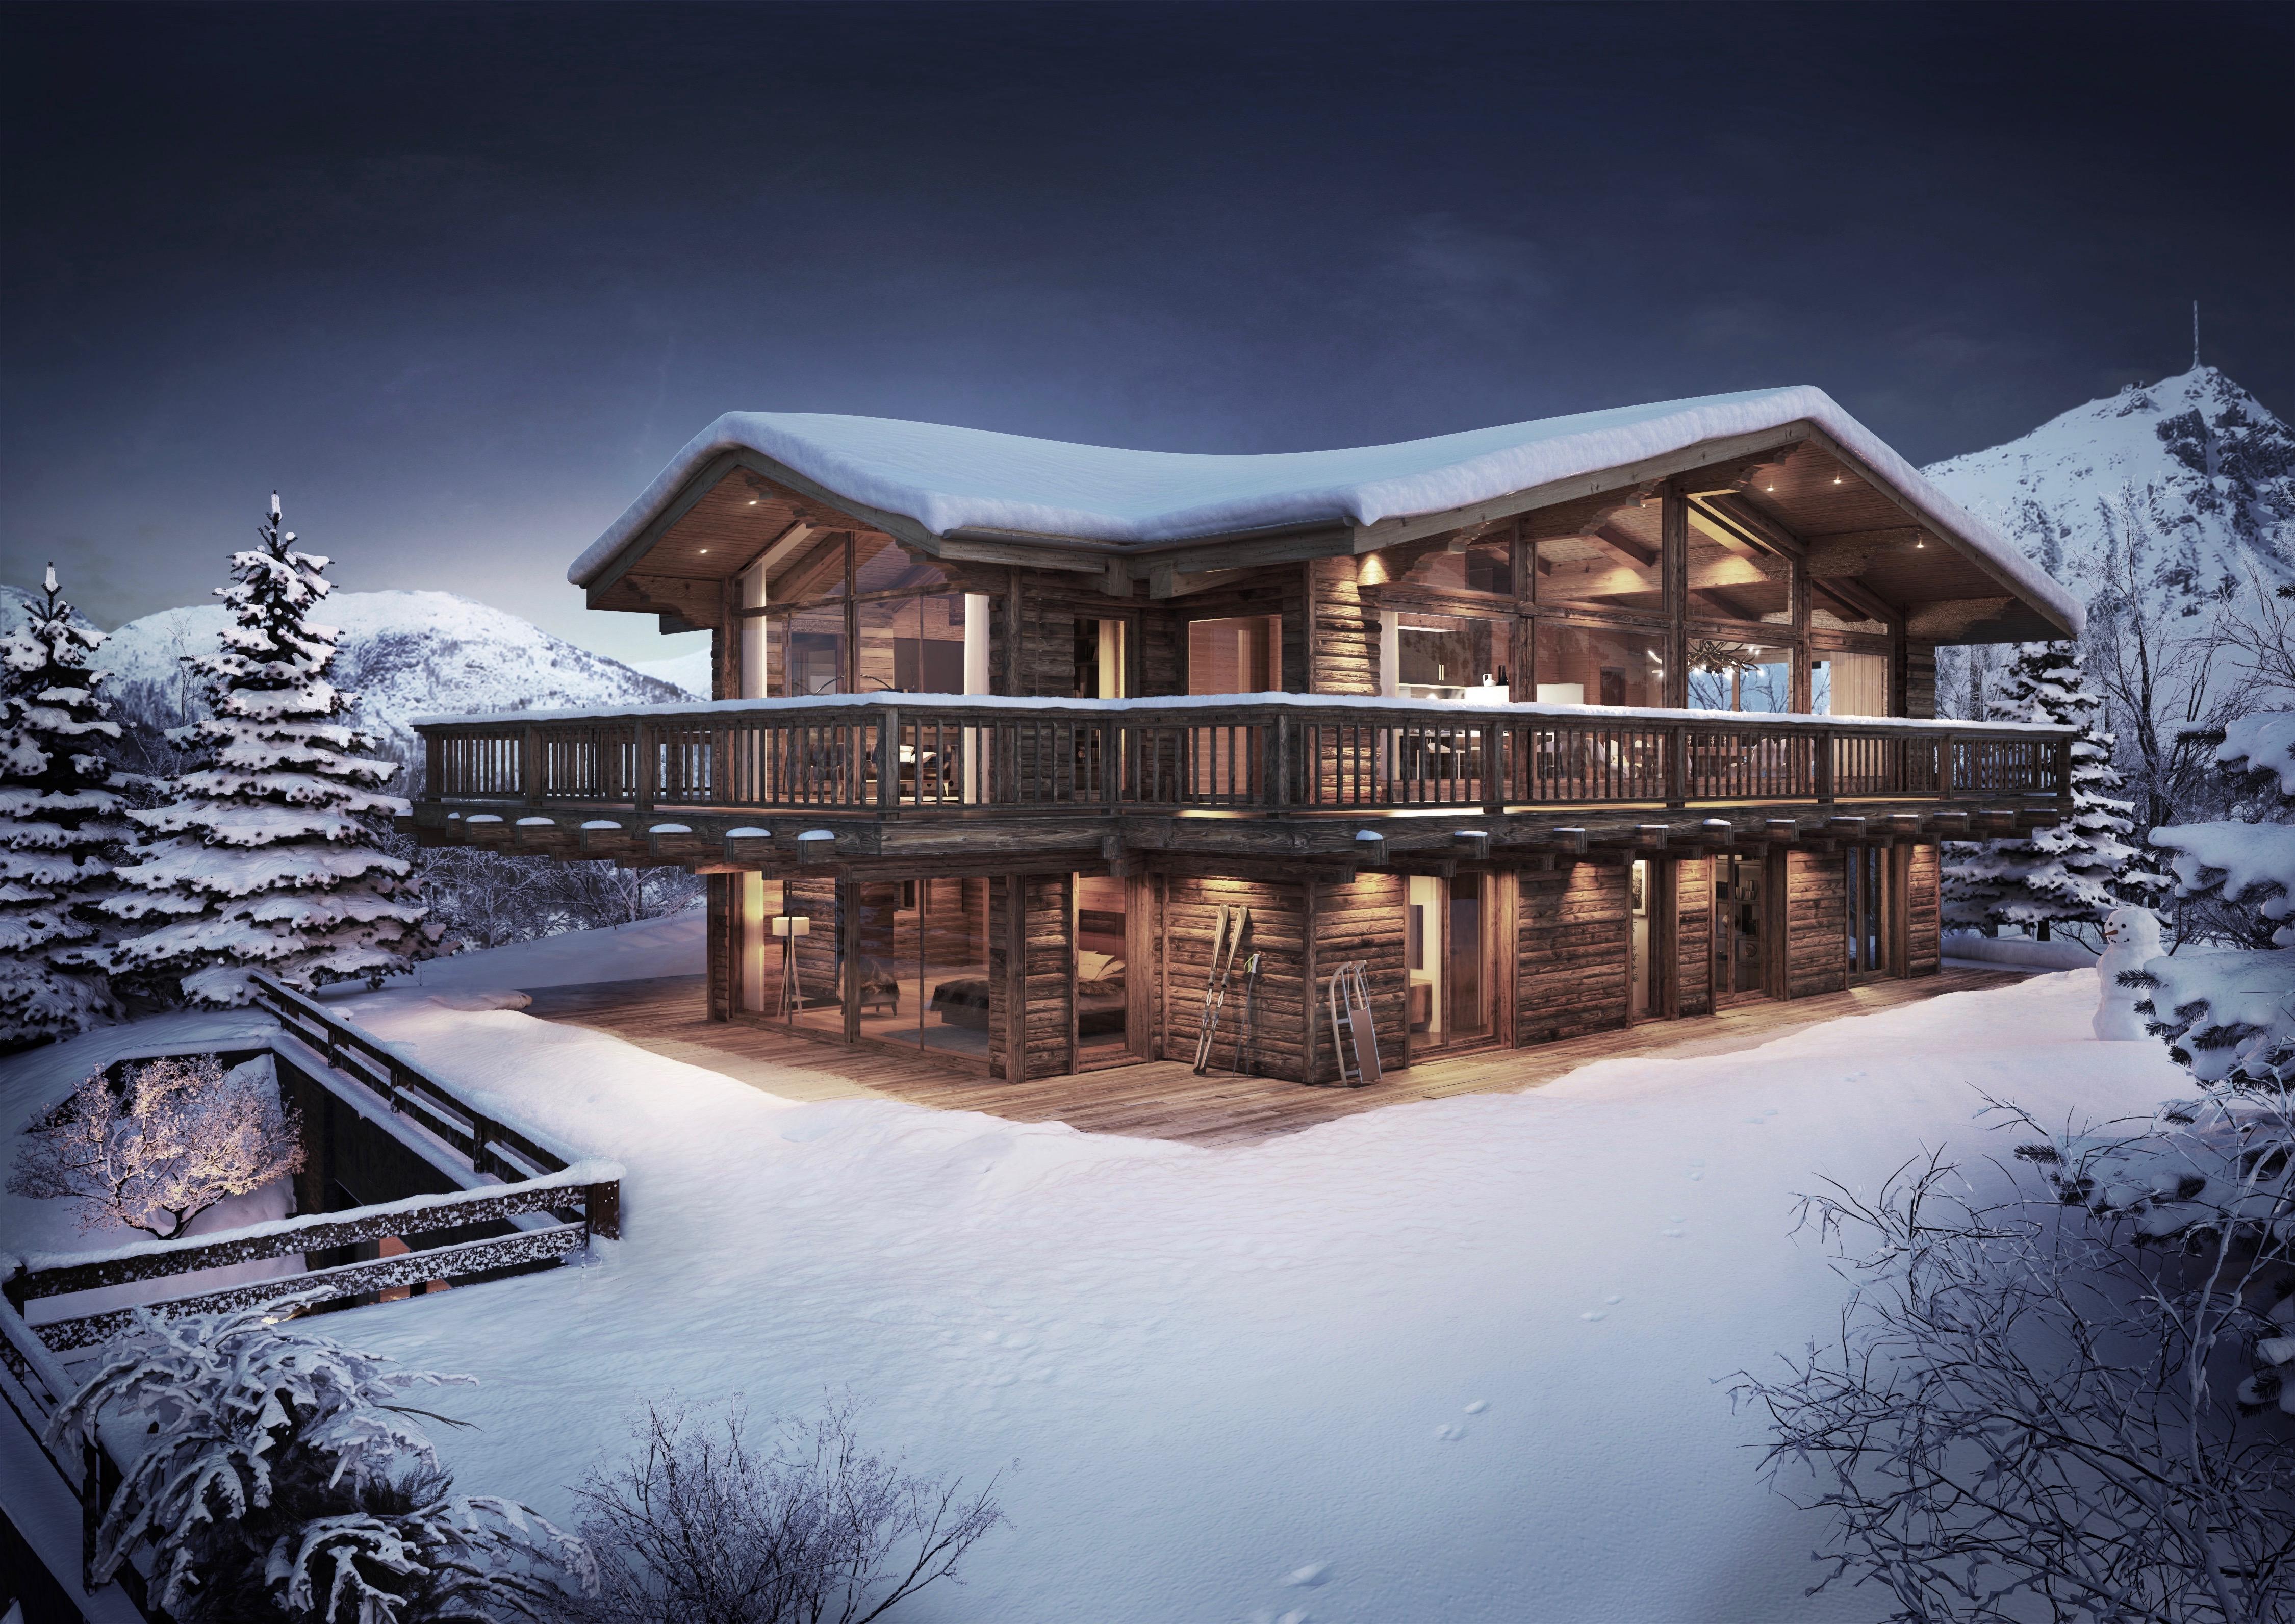 Kitzb hel m concept real estate for Concept homes